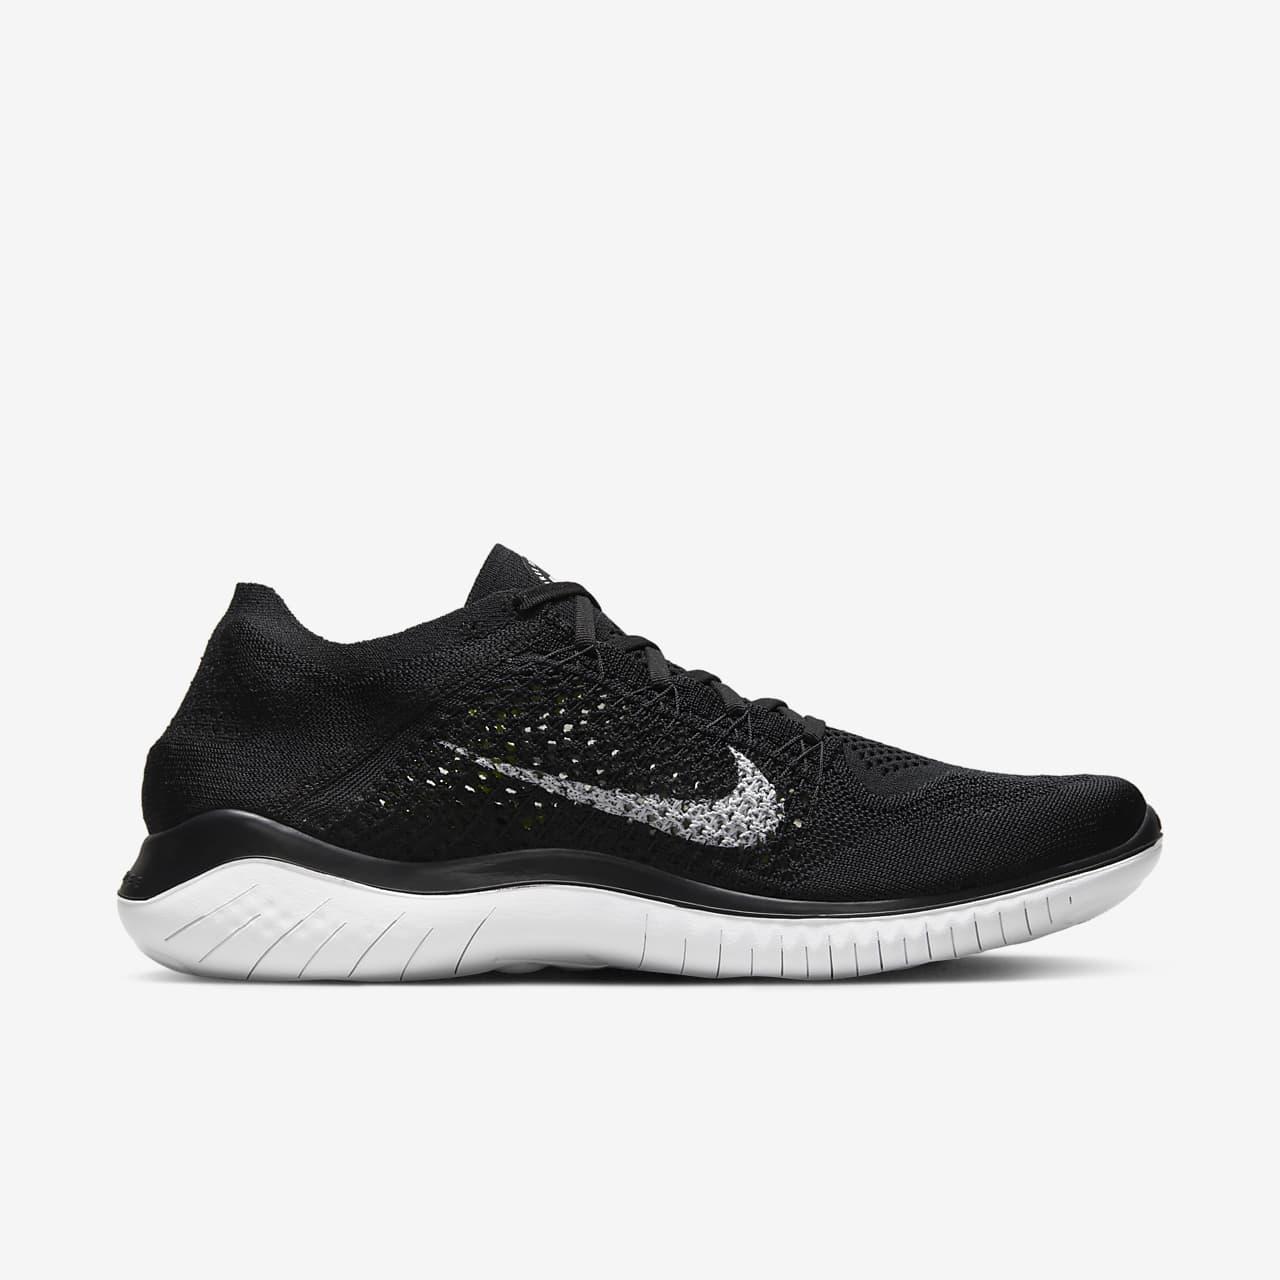 wholesale dealer ddedd 654b6 Nike - Free RN Flyknit 2 chaussures de running pour hommes (noir blanc)